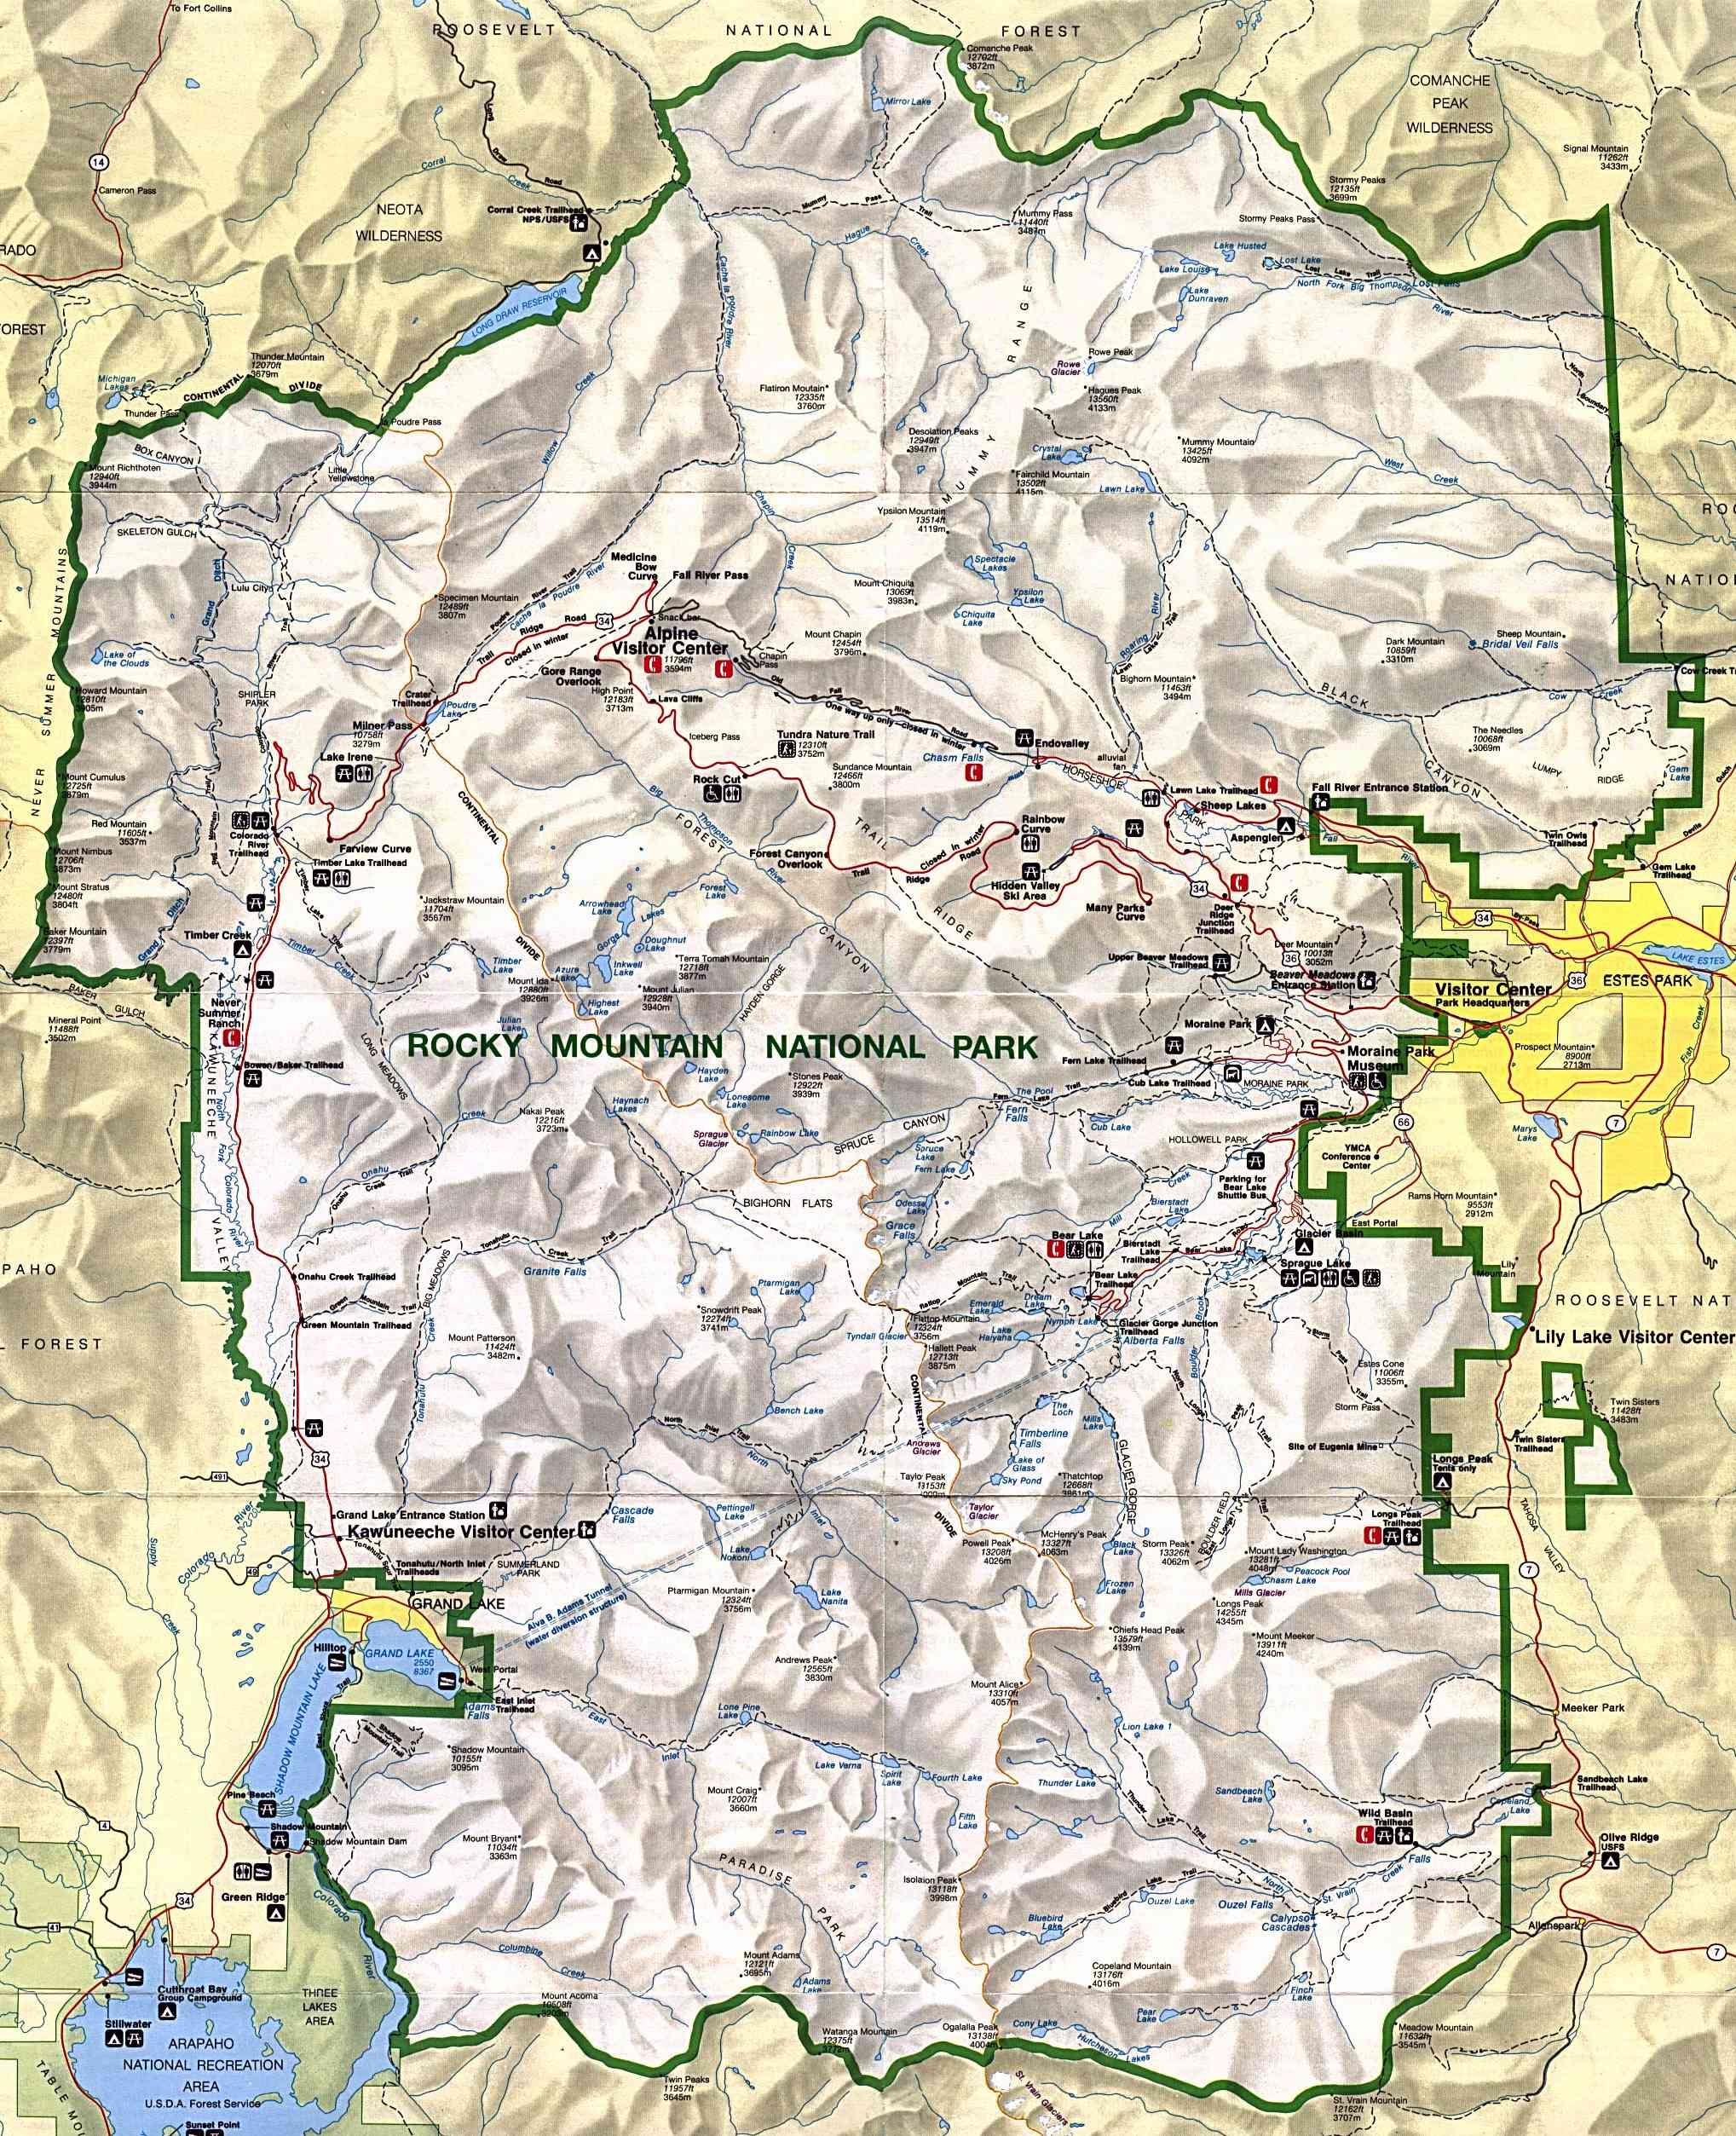 rmnp trail map - Spielbank.us